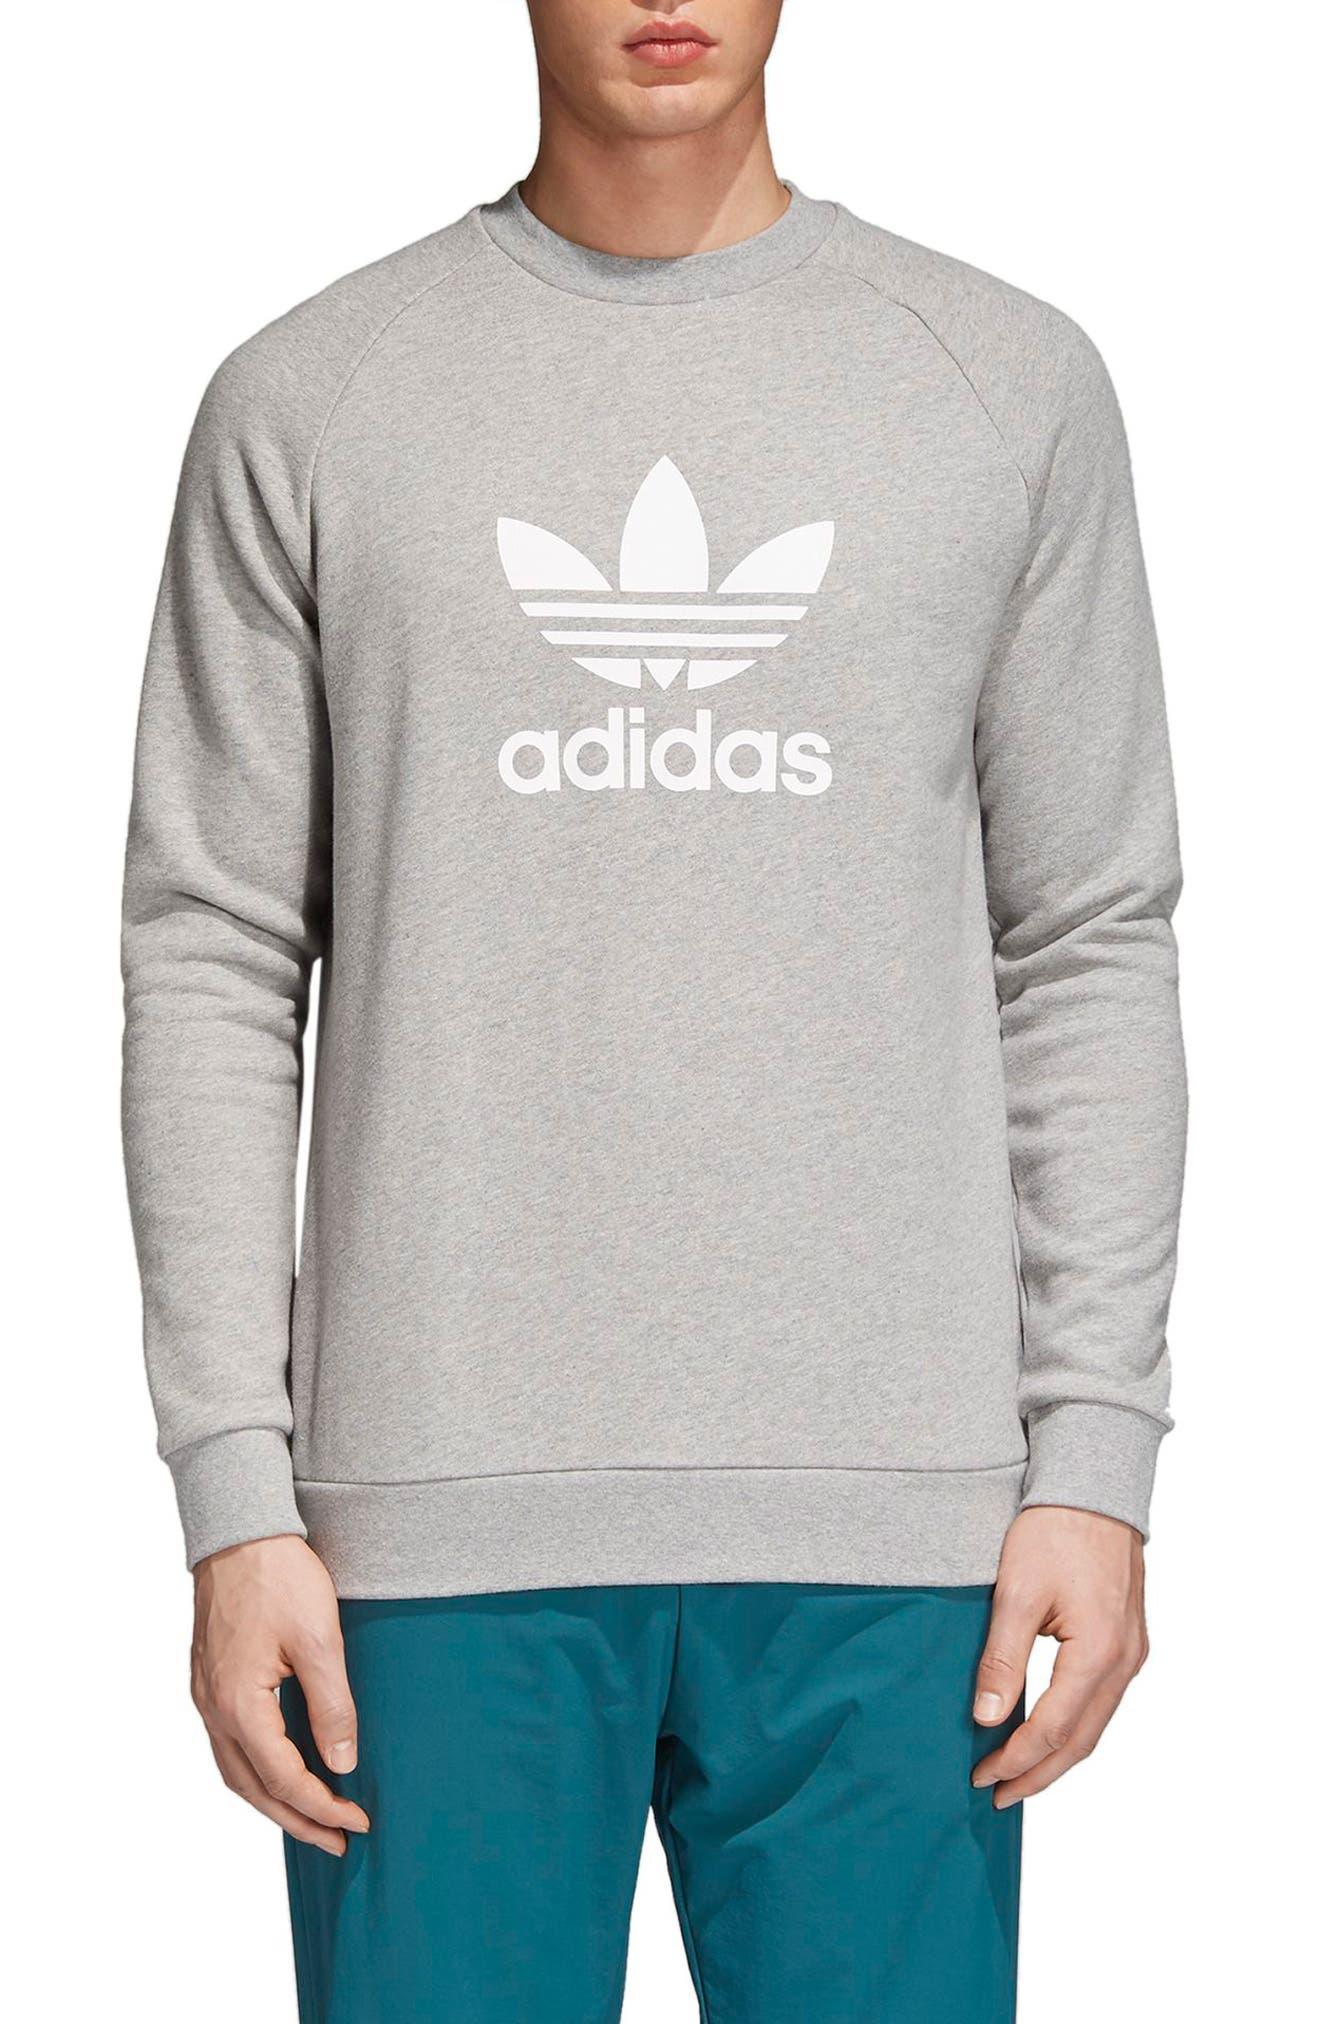 adidas Trefoil Crewneck Sweatshirt,                             Main thumbnail 1, color,                             035